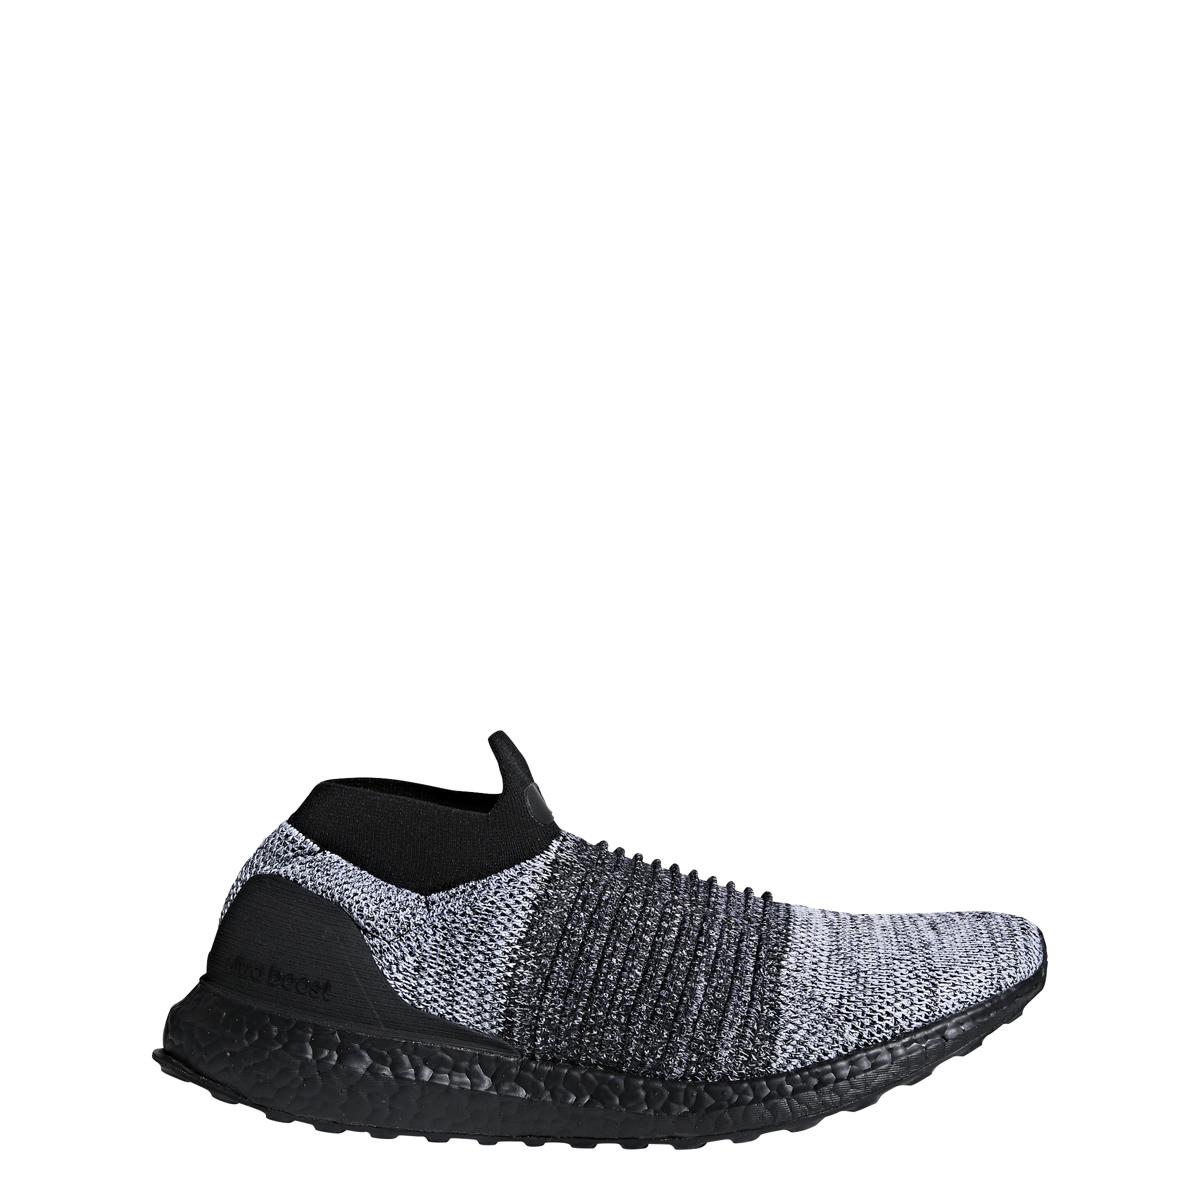 Adidas UltraBoost Laceless in Triple White — MAJOR